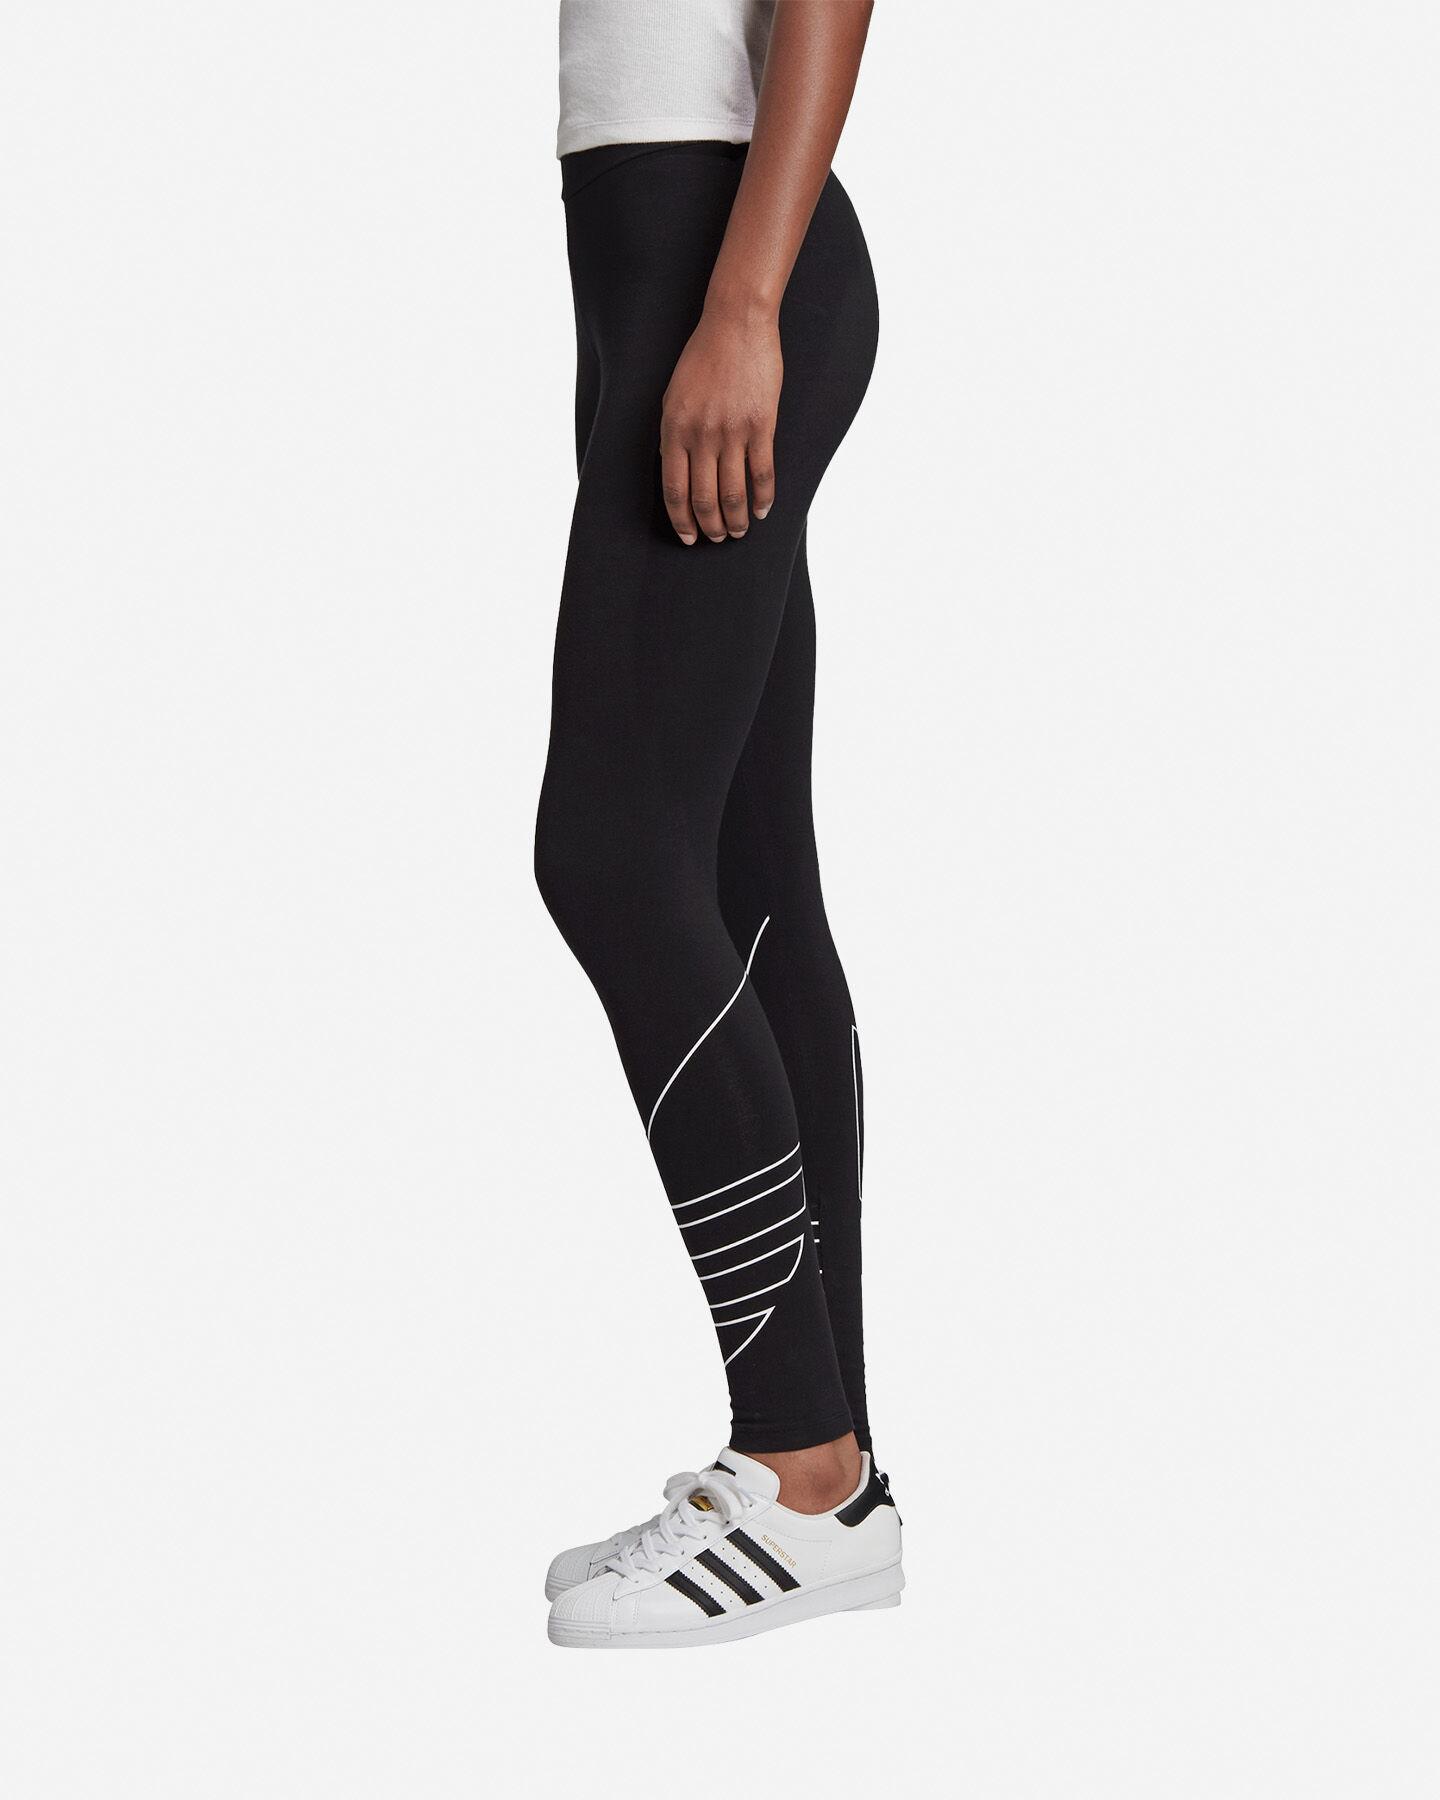 Jeans ADIDAS ORIGINALS BIG TREFOIL W S5210138 scatto 3